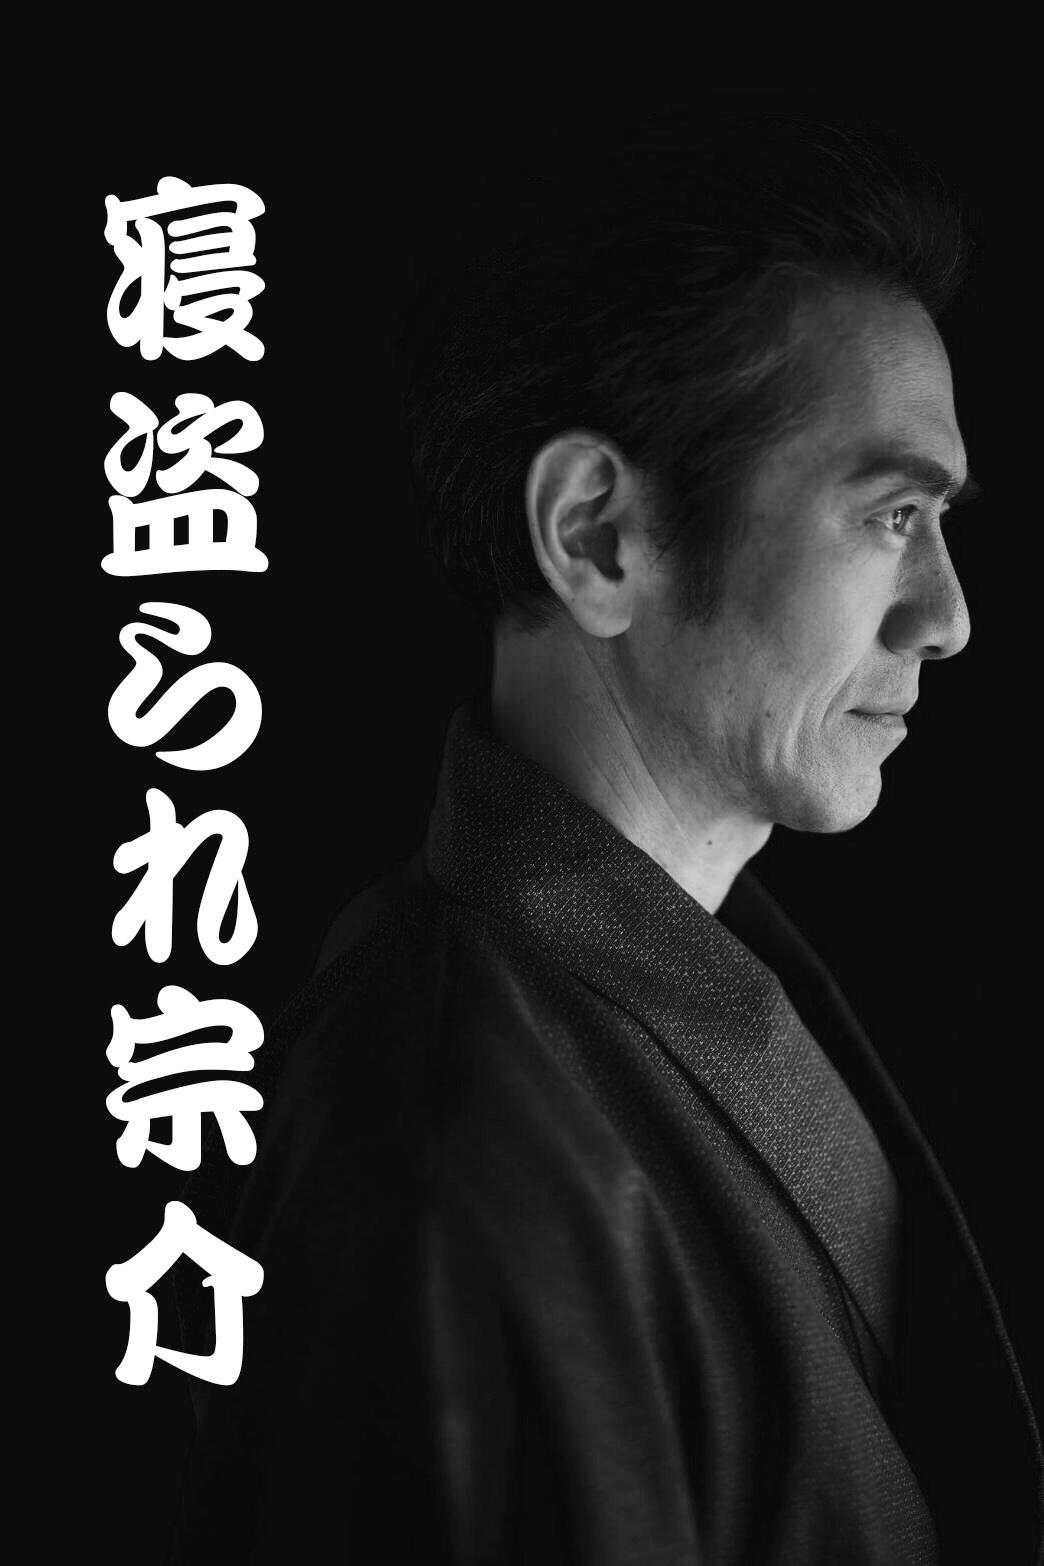 舞台『寝盗られ宗介』in 浅草 木馬亭_f0061797_14590892.jpg